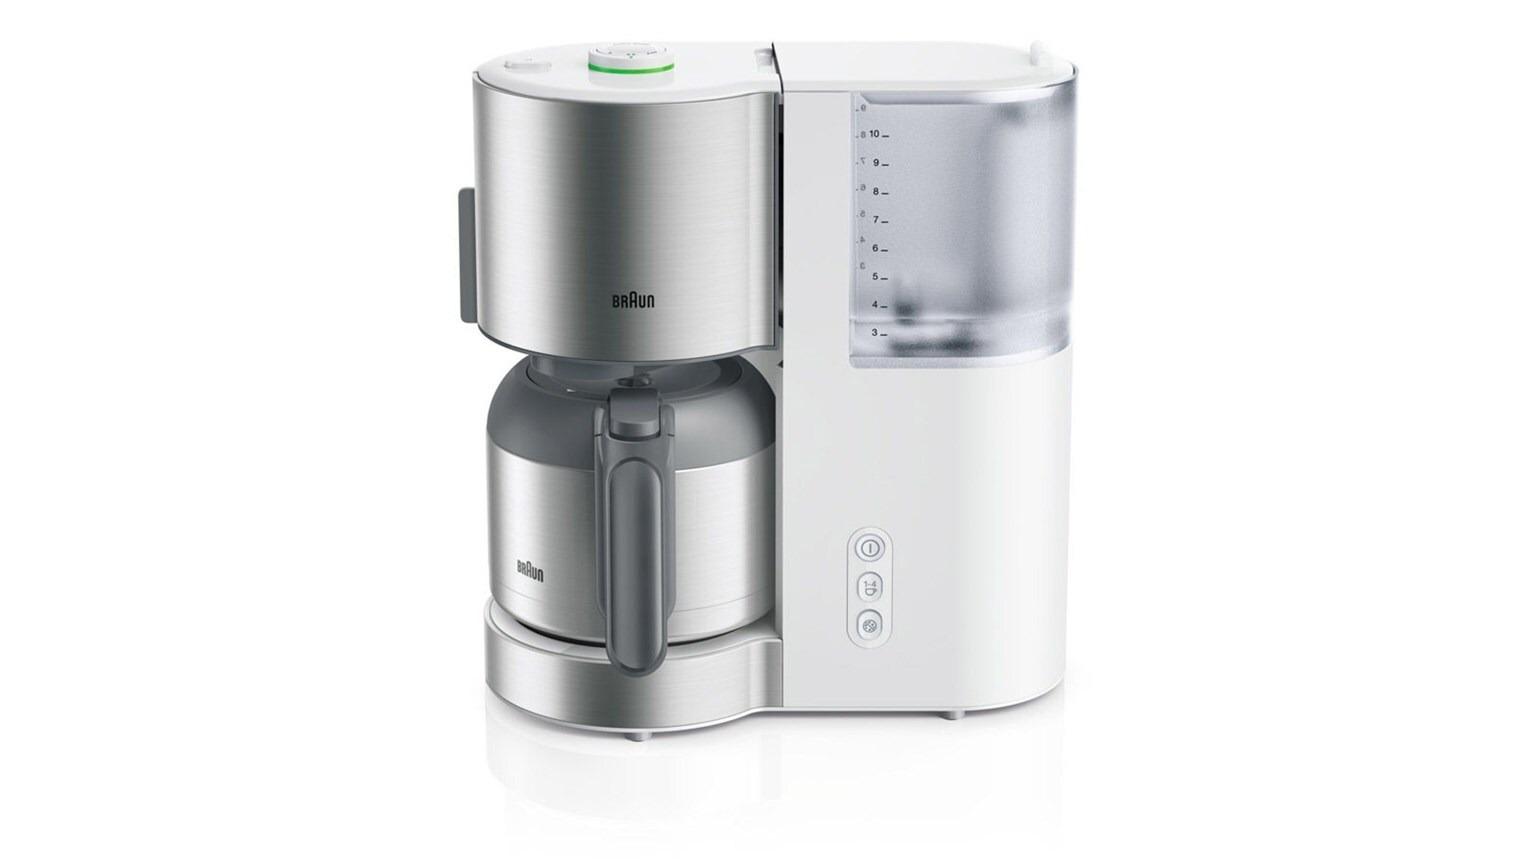 Braun KF5105 WH koffiefilter apparaat